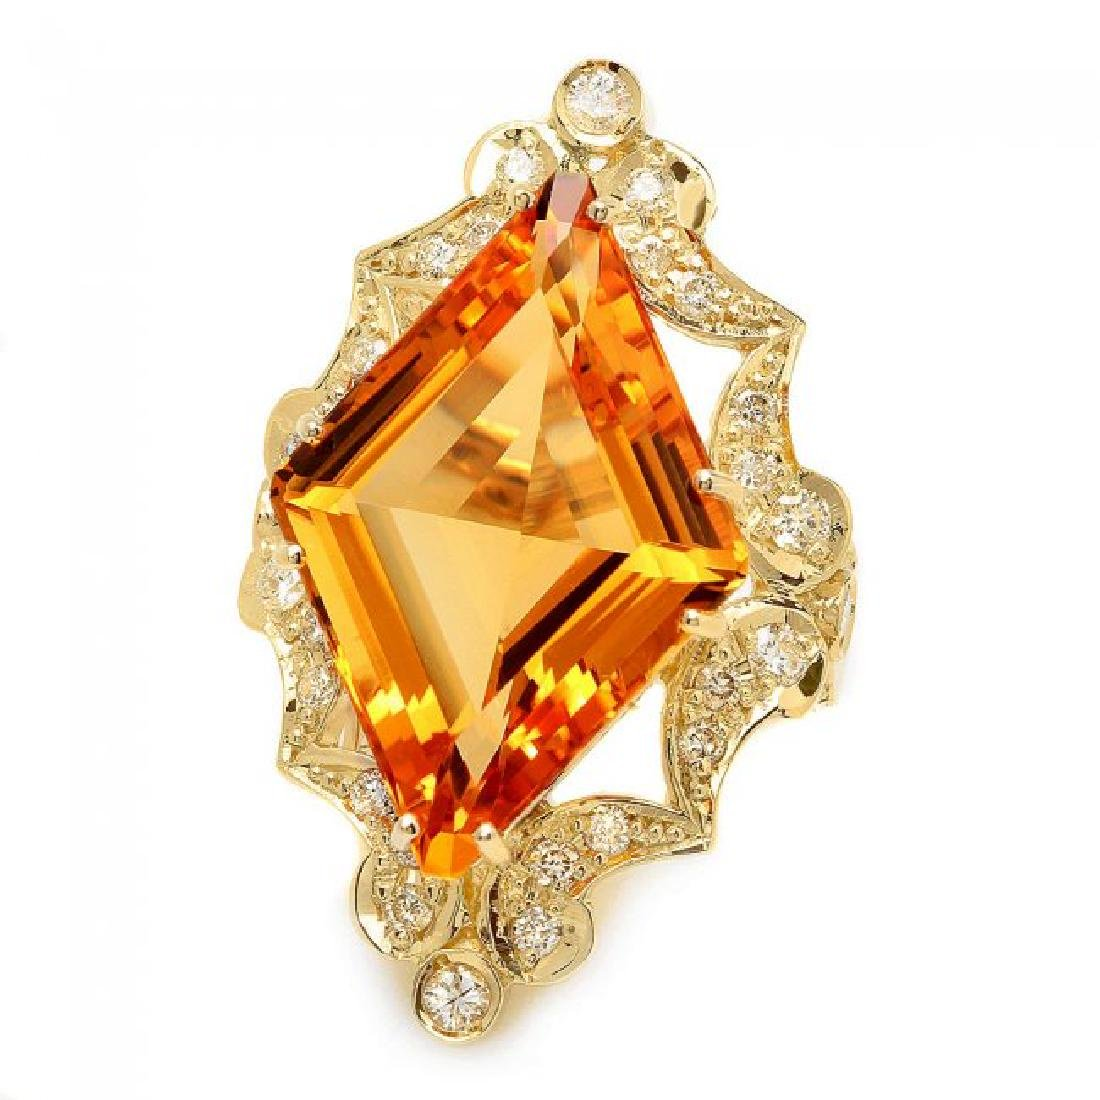 14k Gold 16.00ct Citrine 1.00ct Diamond Ring - 2